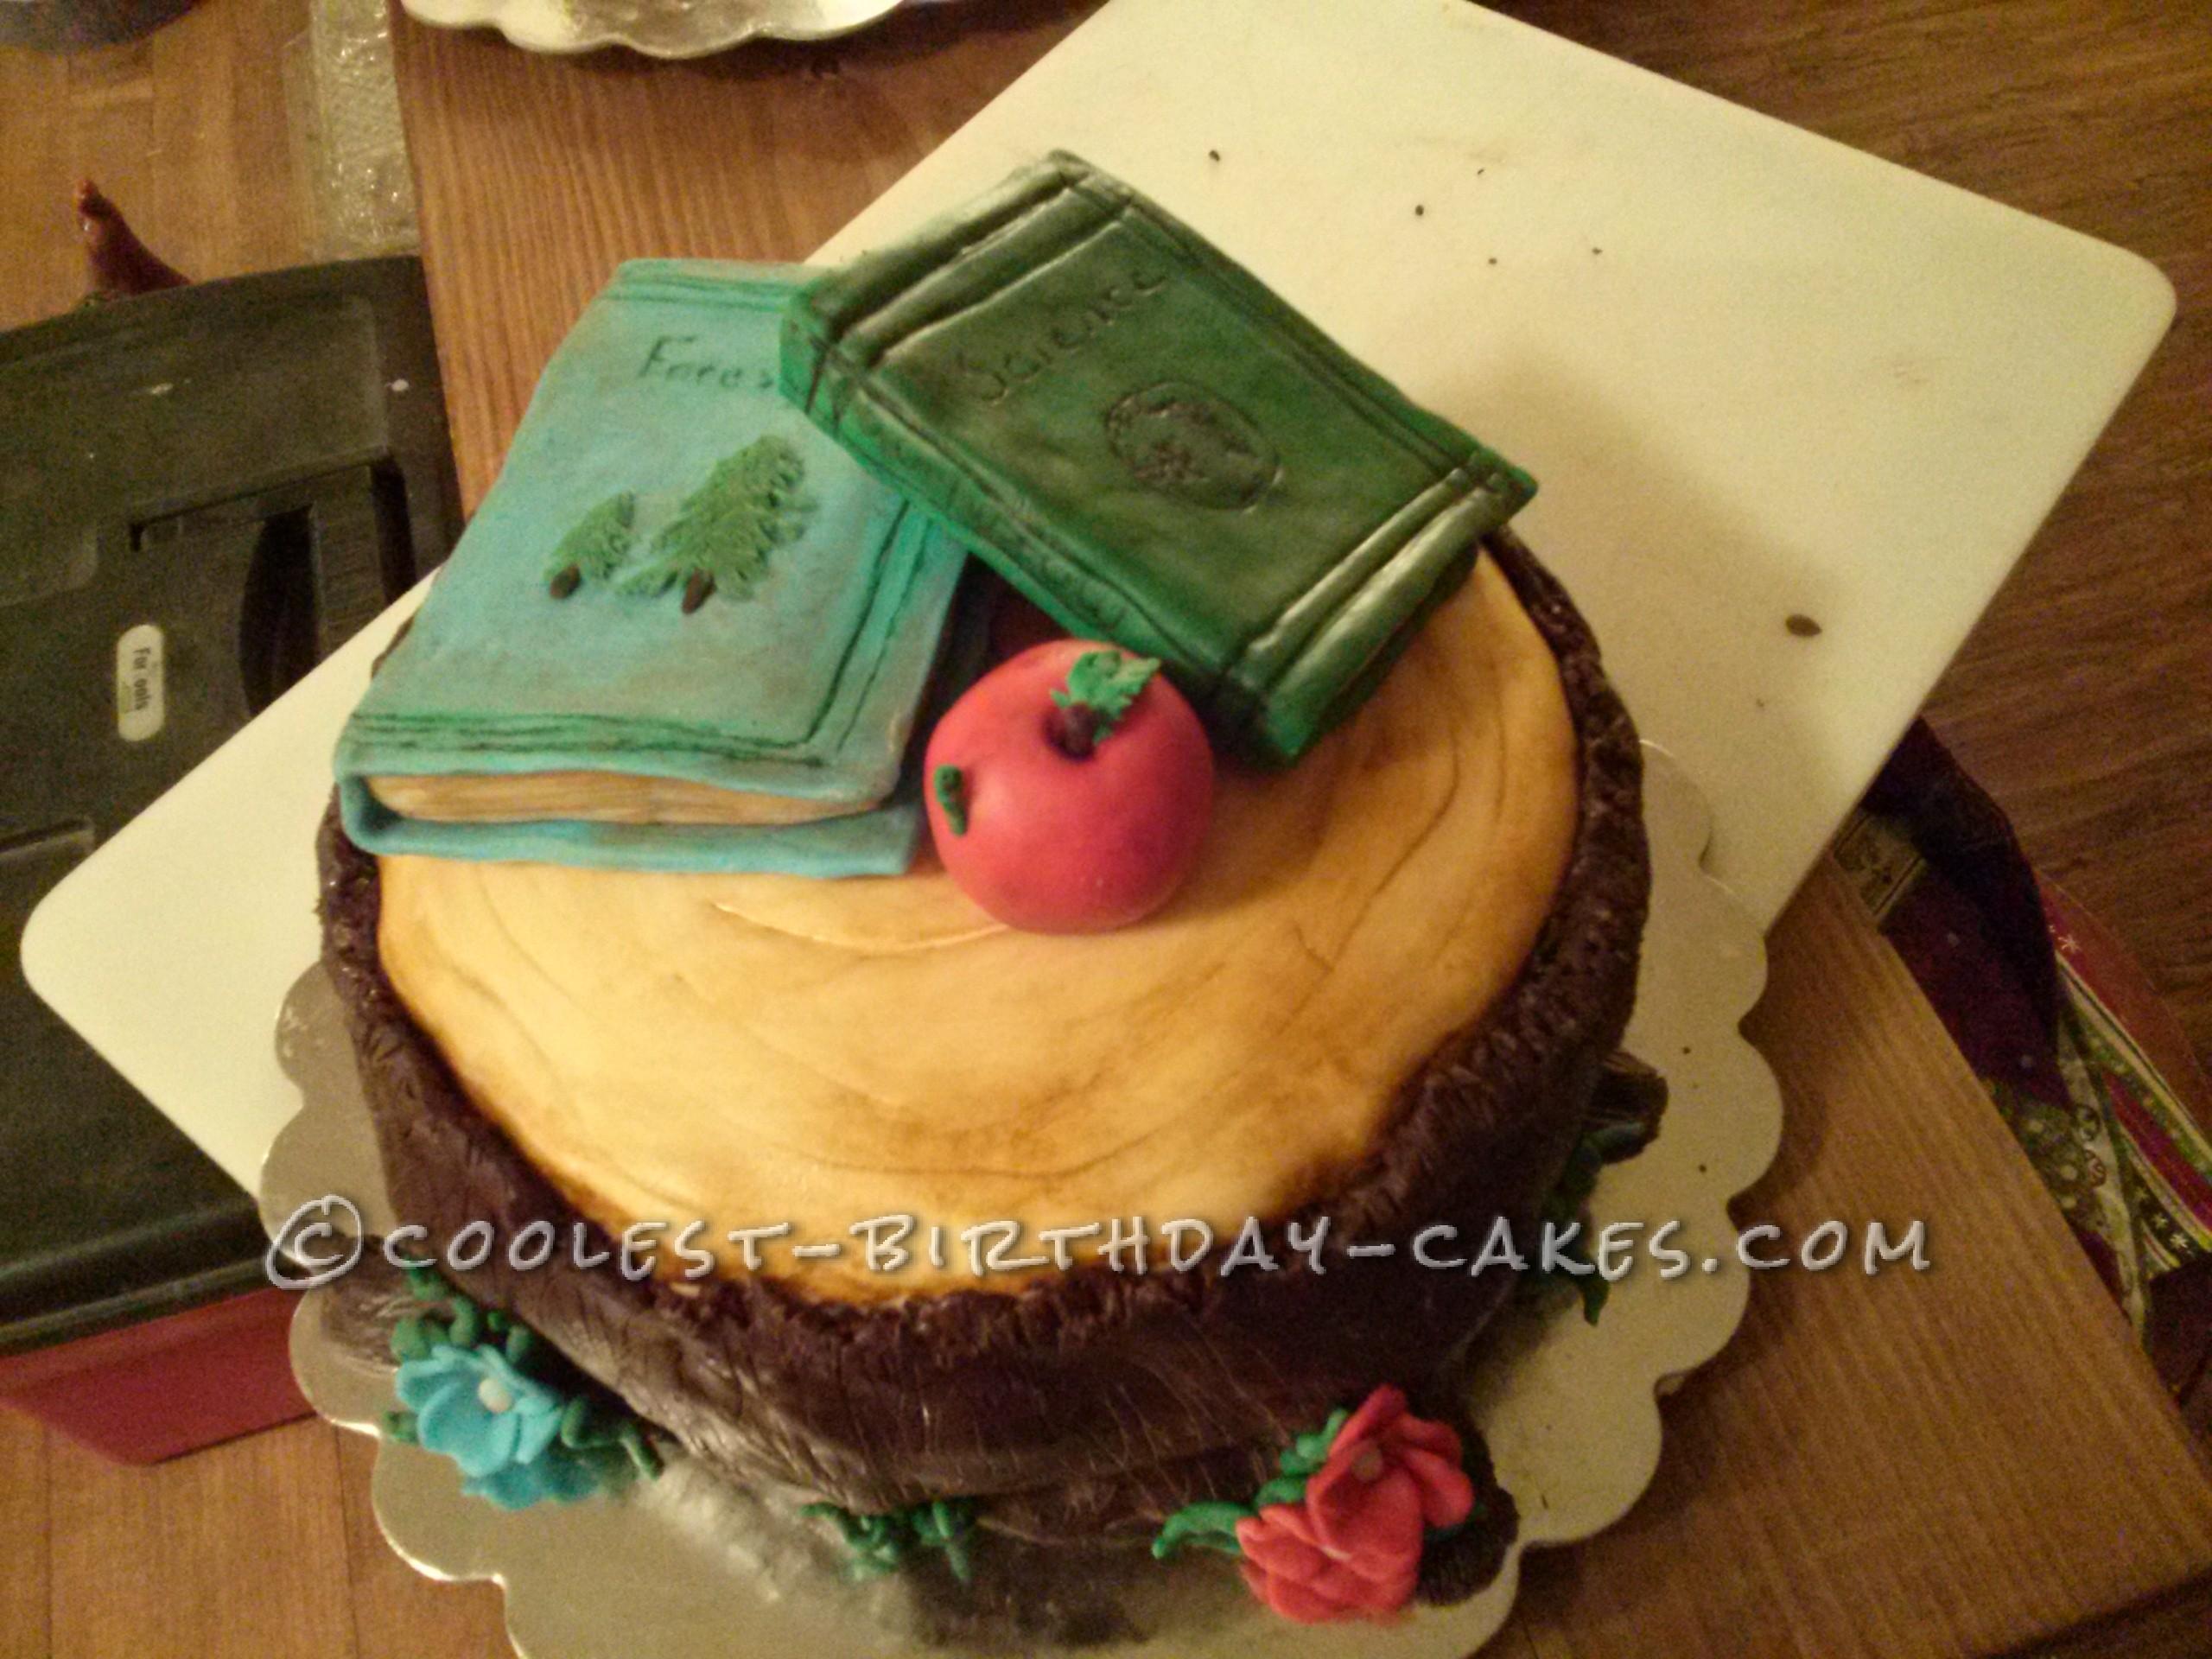 Cool Books and Stump Cake for a Lumberjill